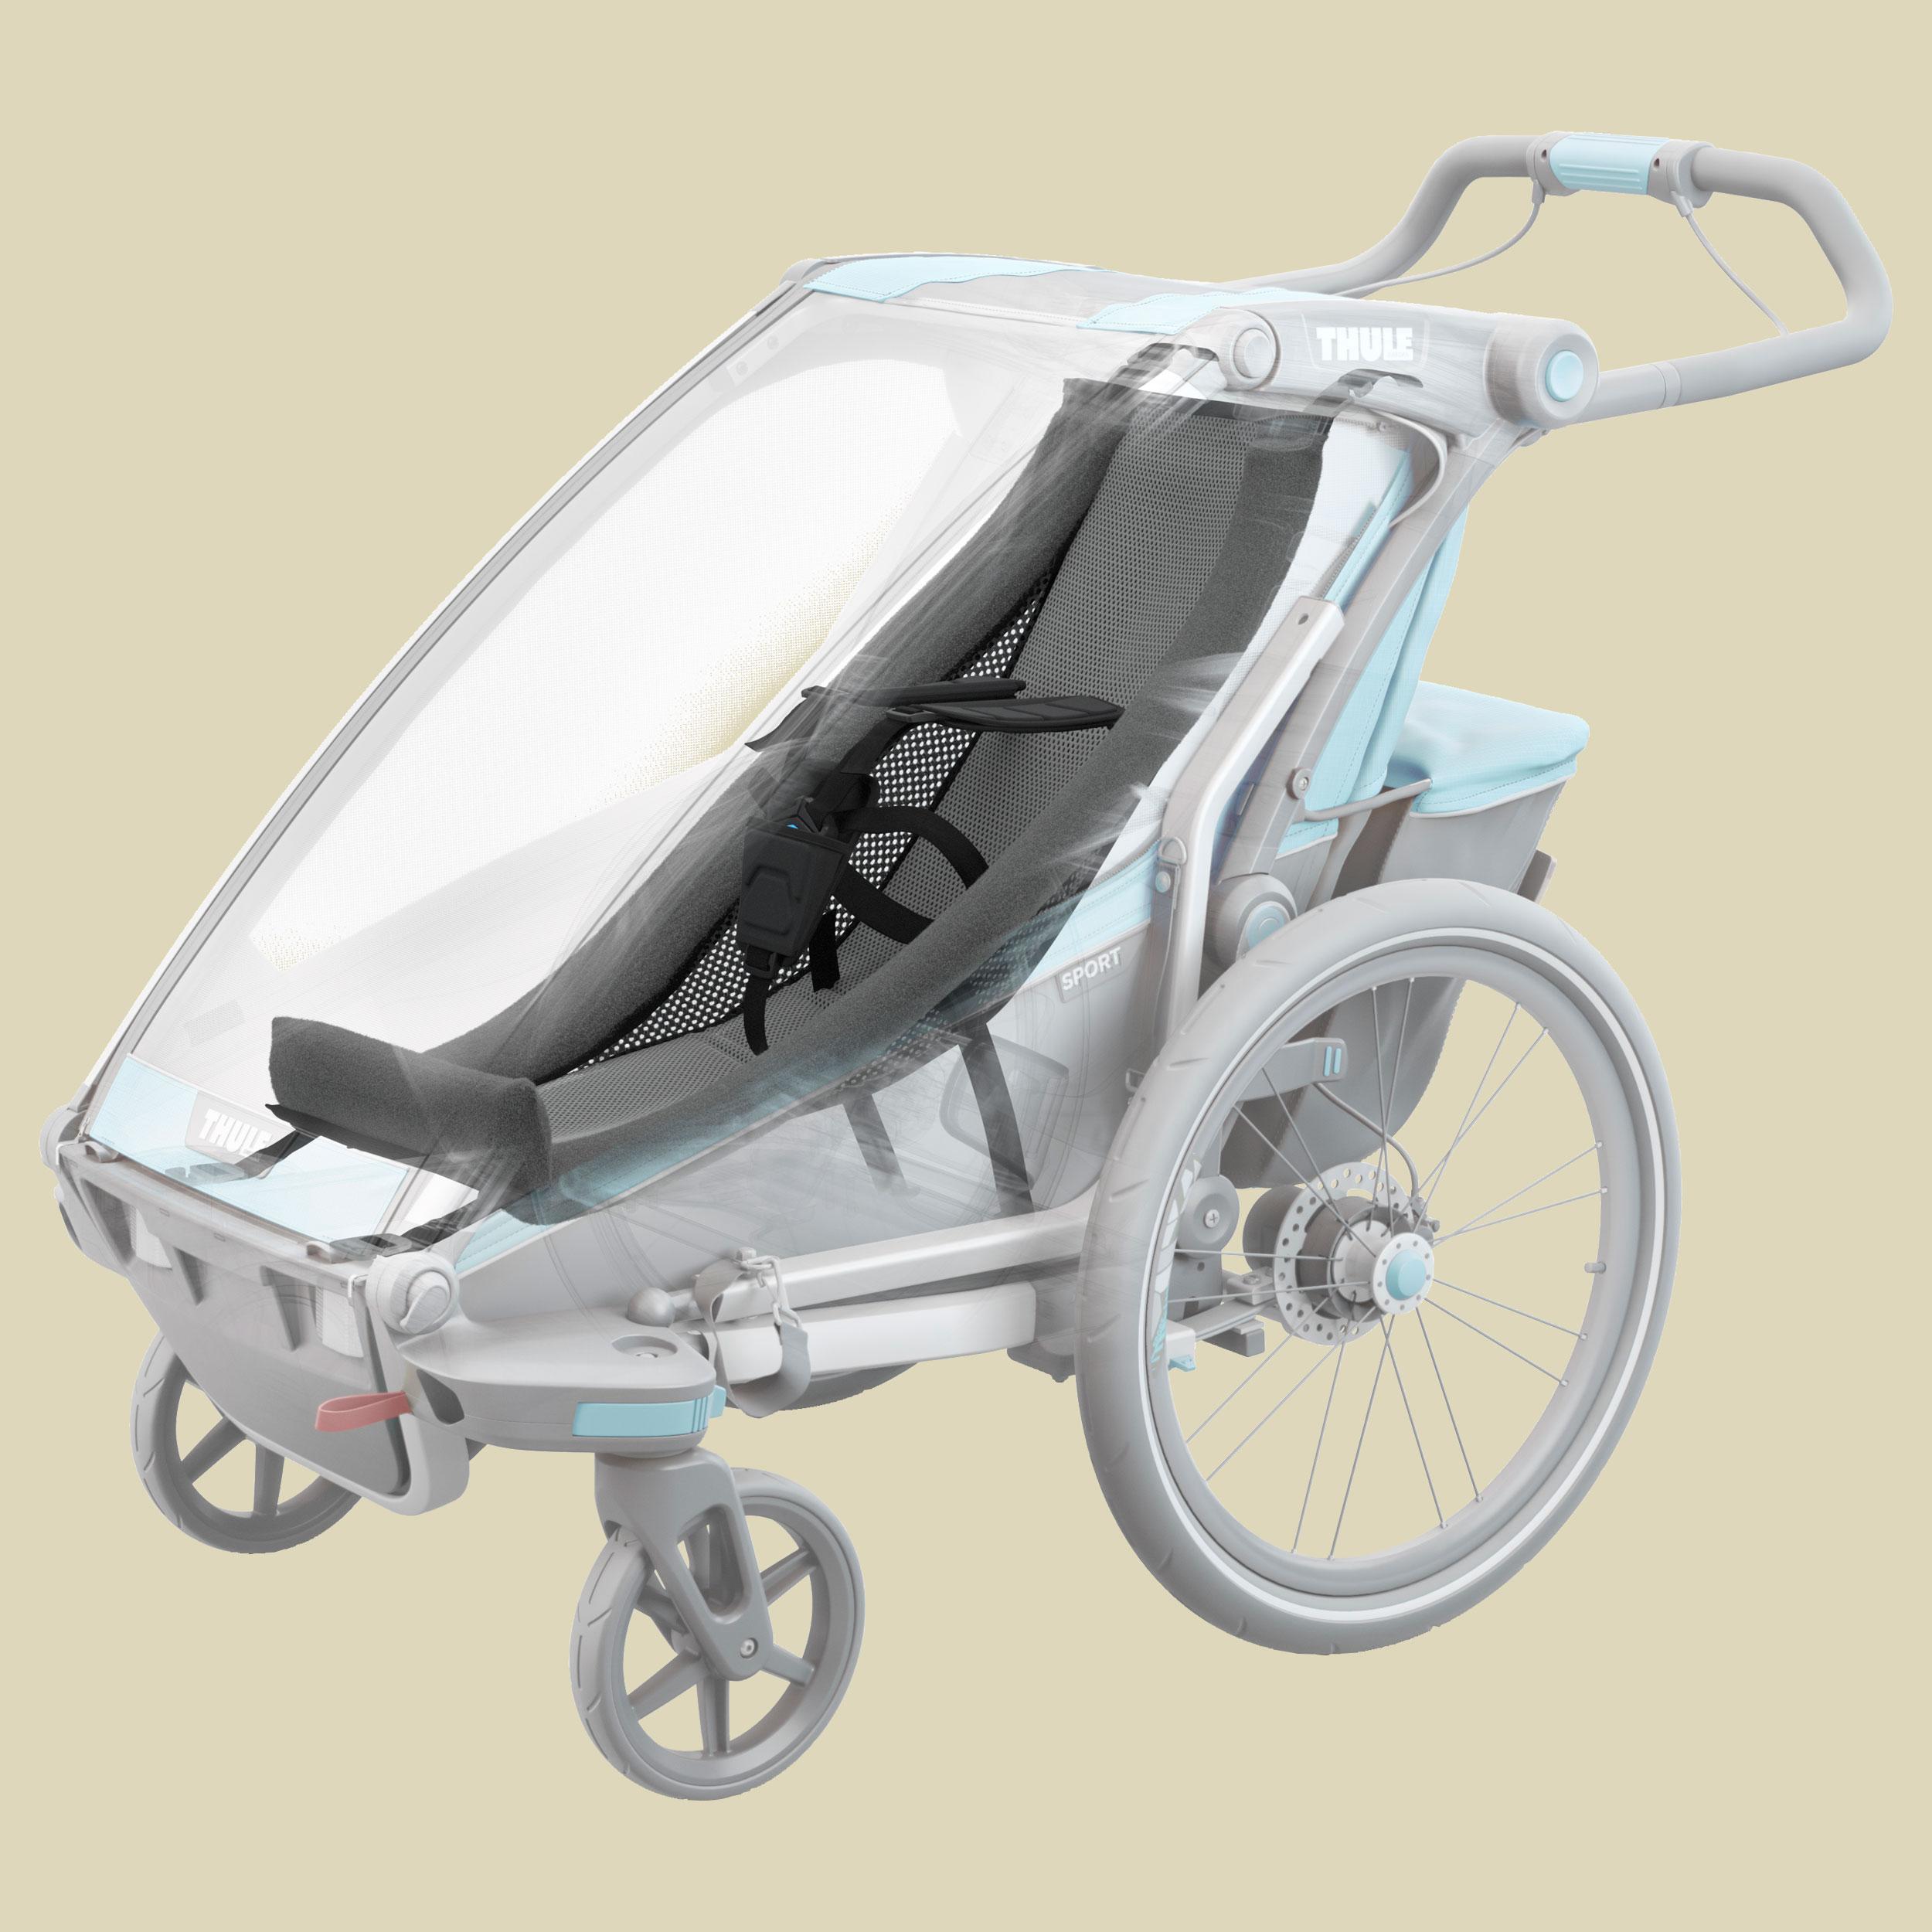 Thule Chariot Infant Sling Babysitz f'r Fahrradanh'nger f'r Modelle ab 2017